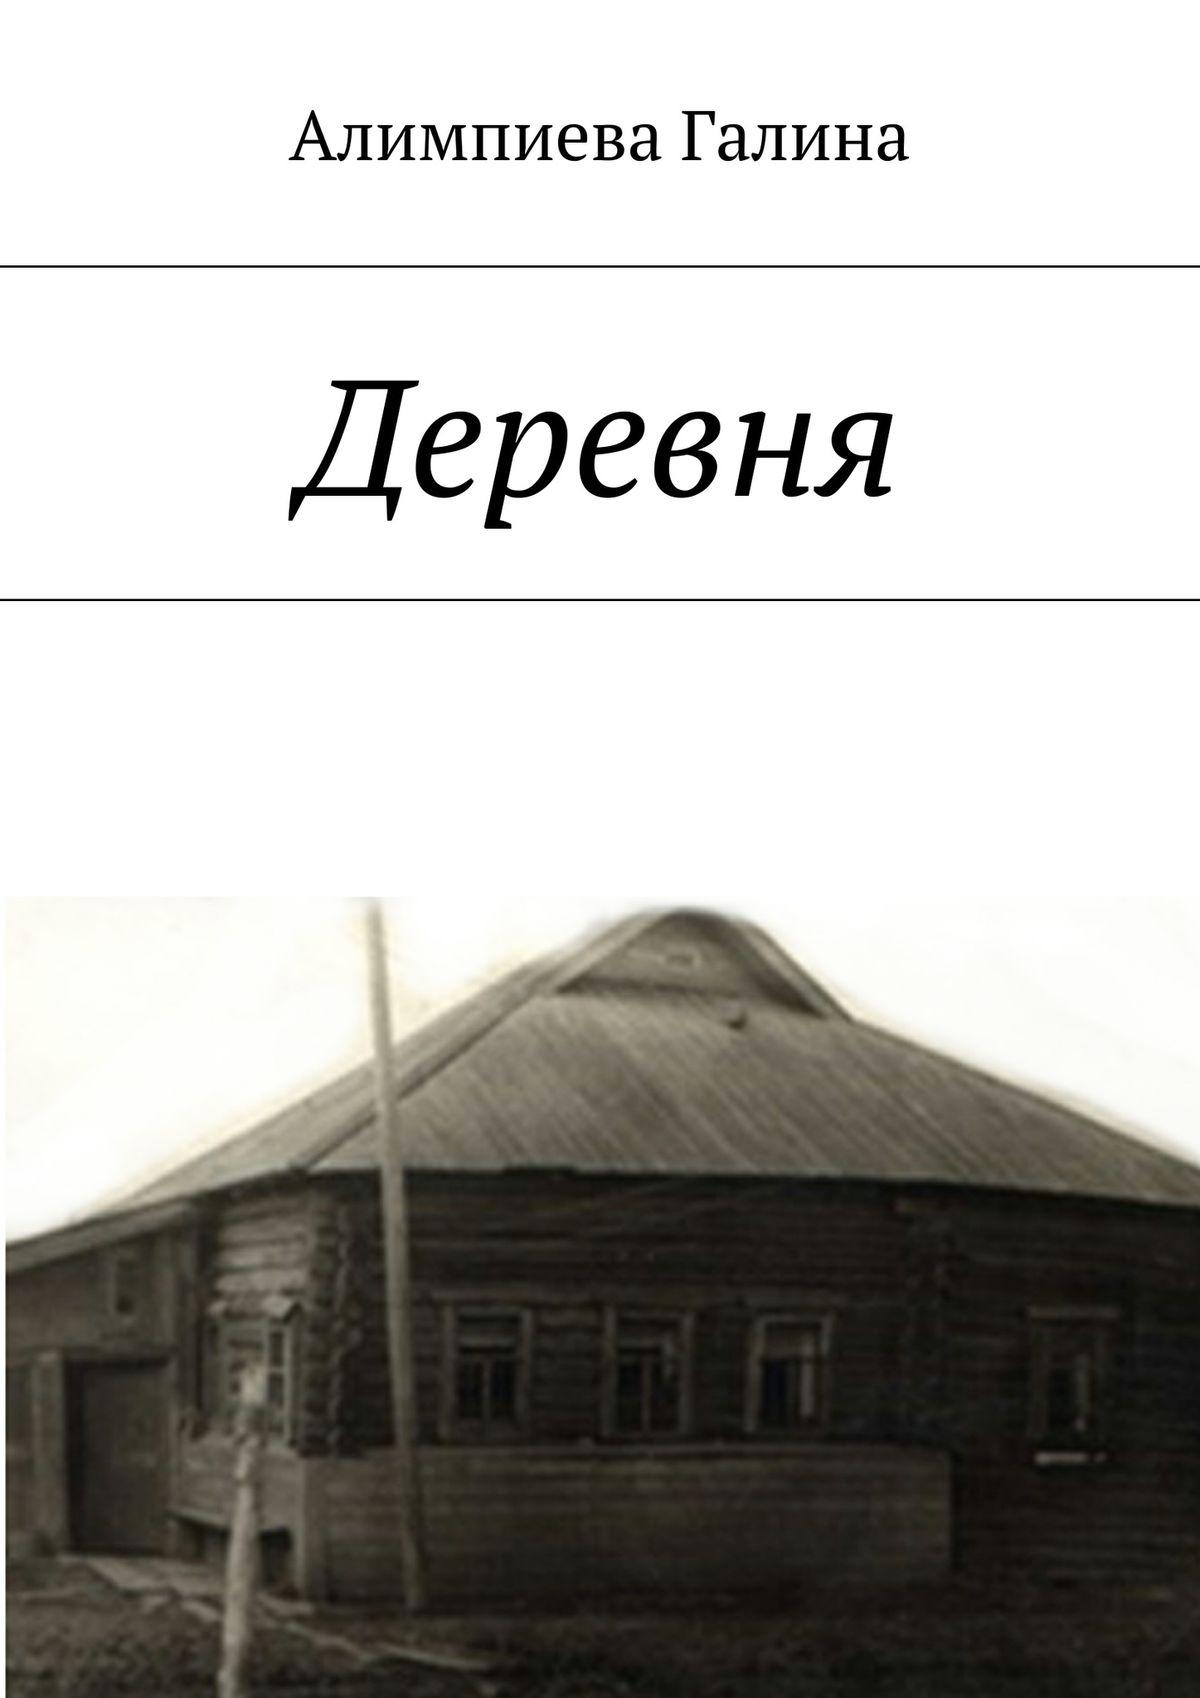 Галина Алимпиева Деревня дом в деревне г астрахани и области